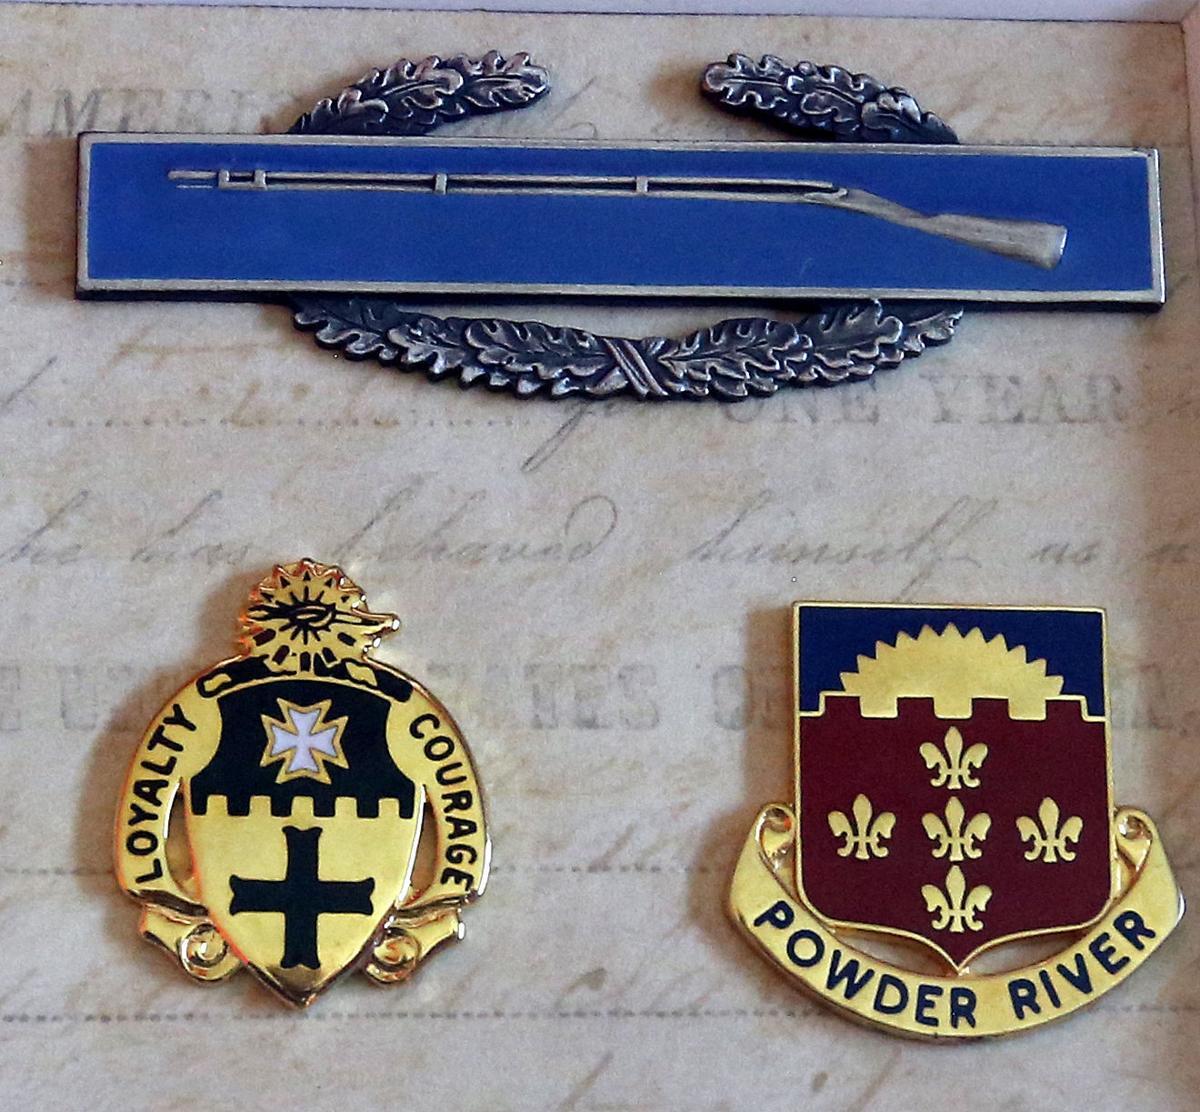 Jim Swan's medals